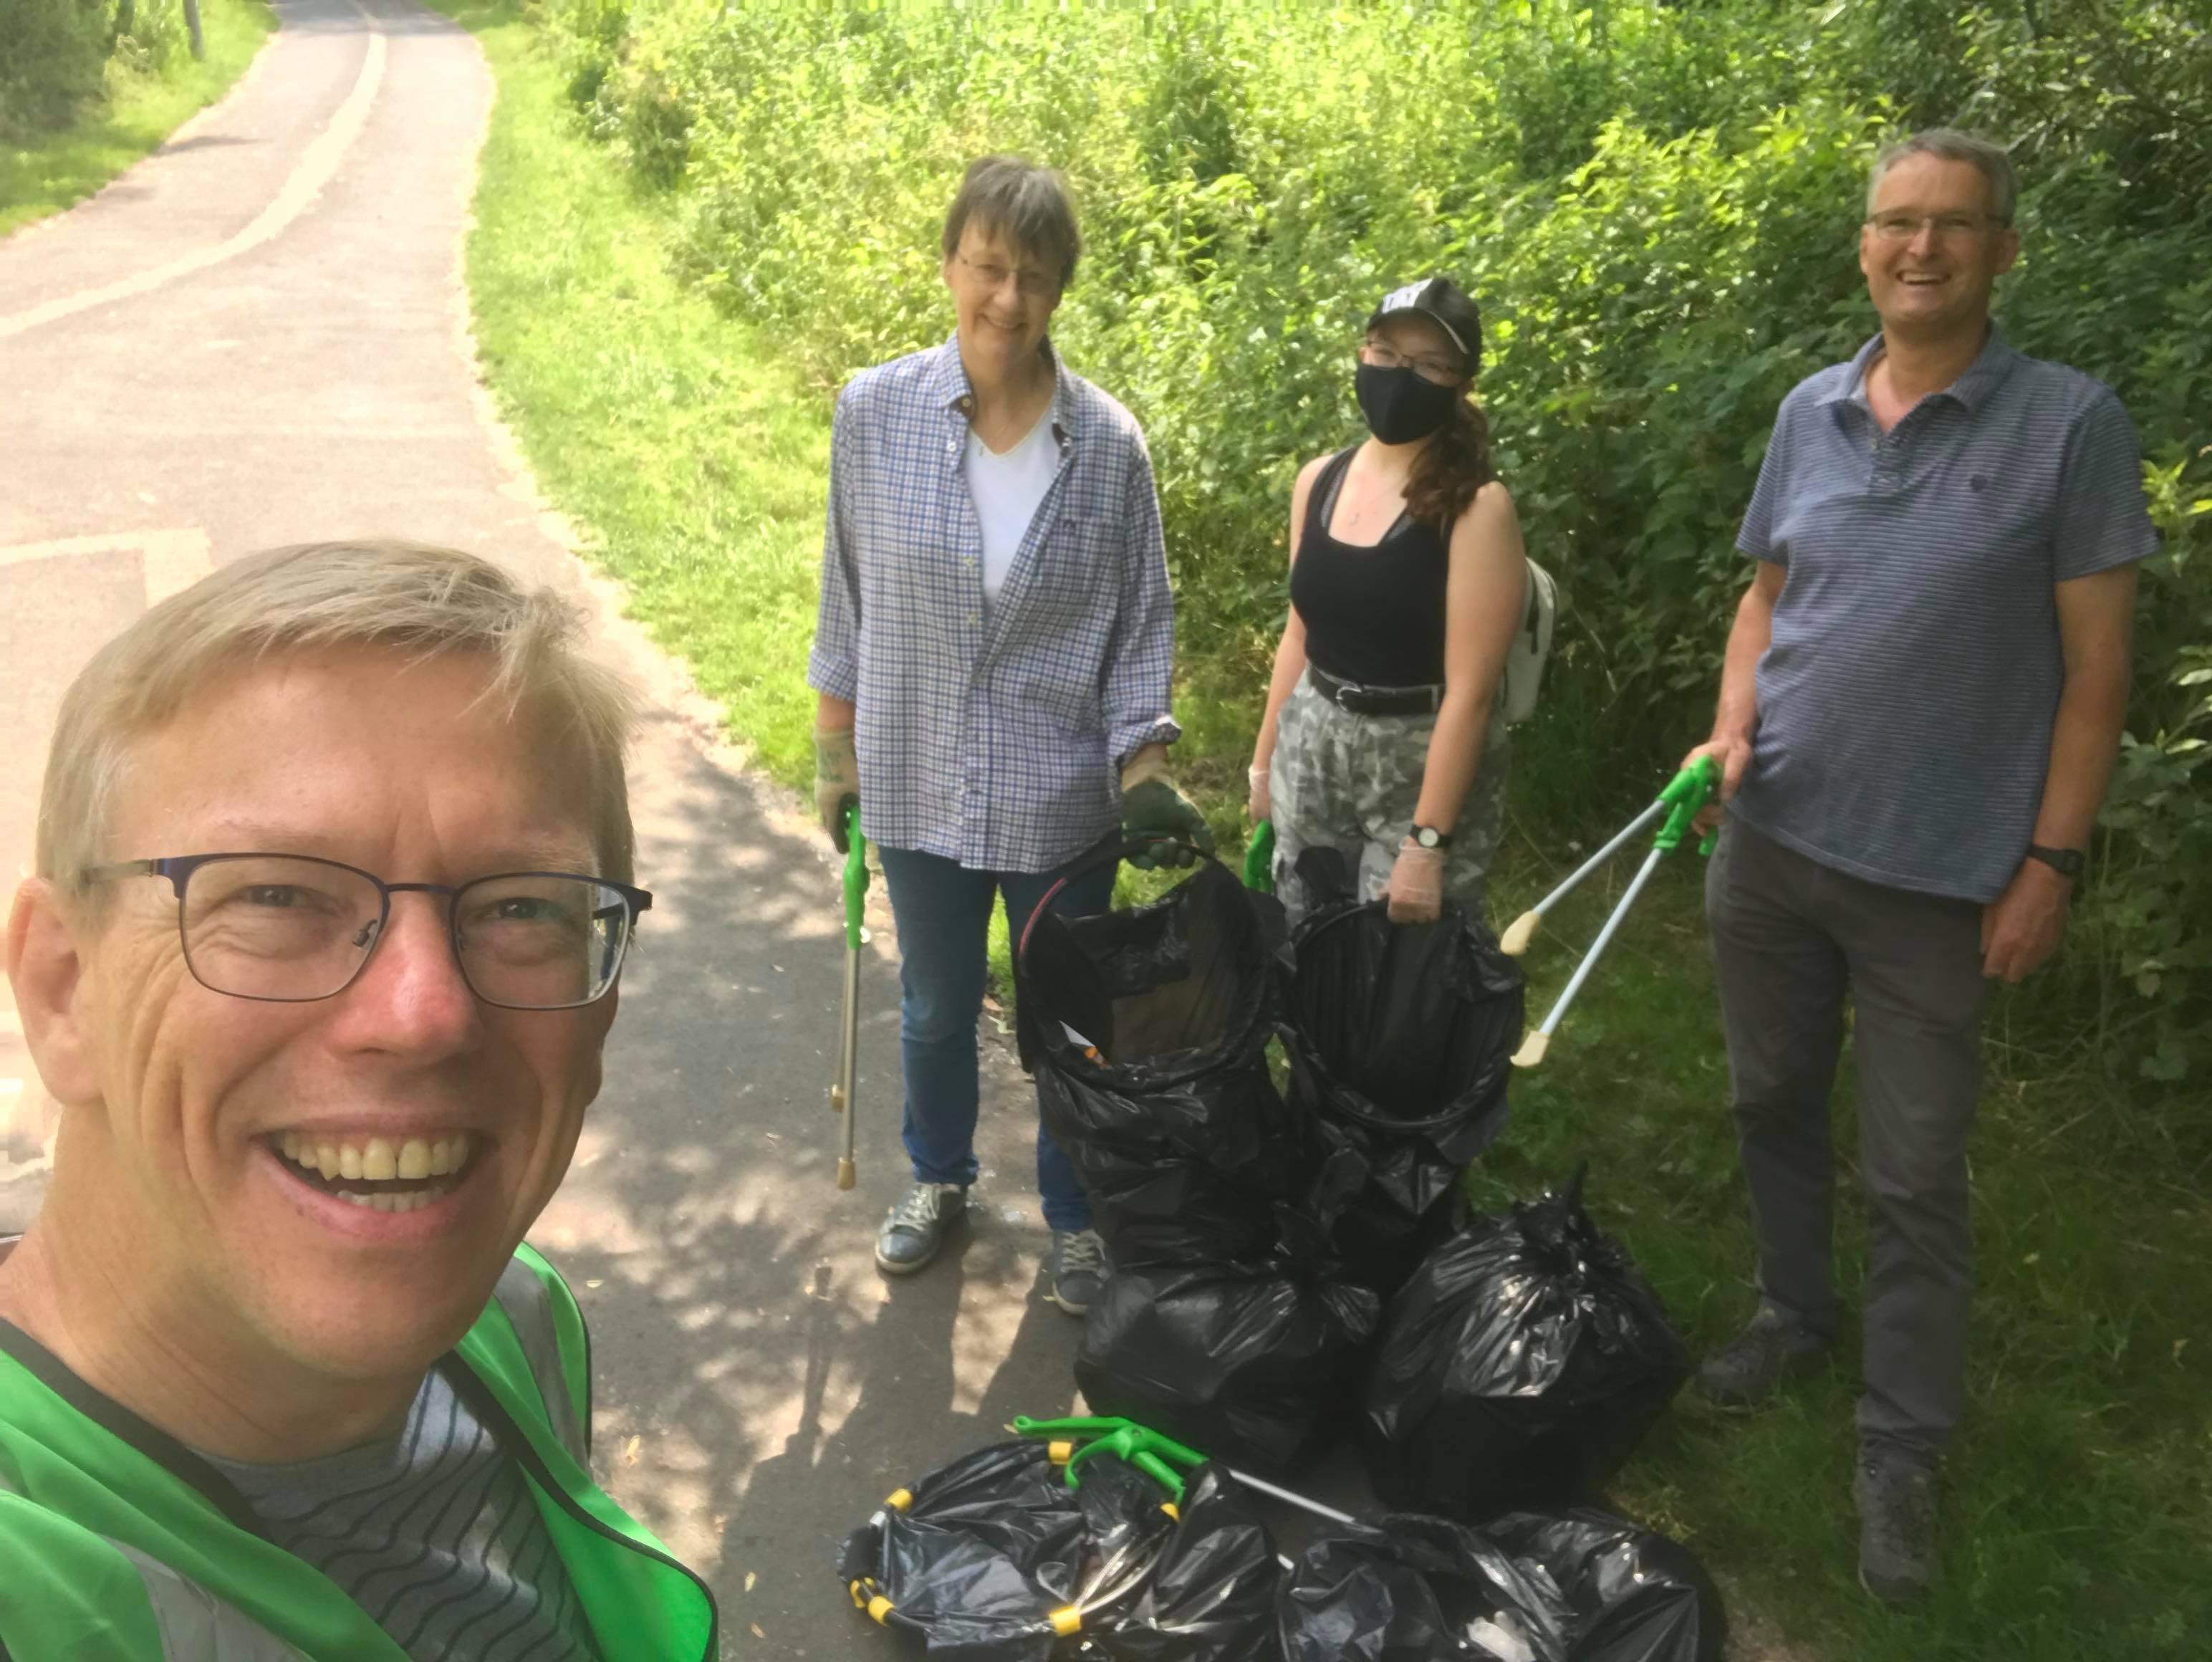 Volunteer litter pickers tackle rubbish in park